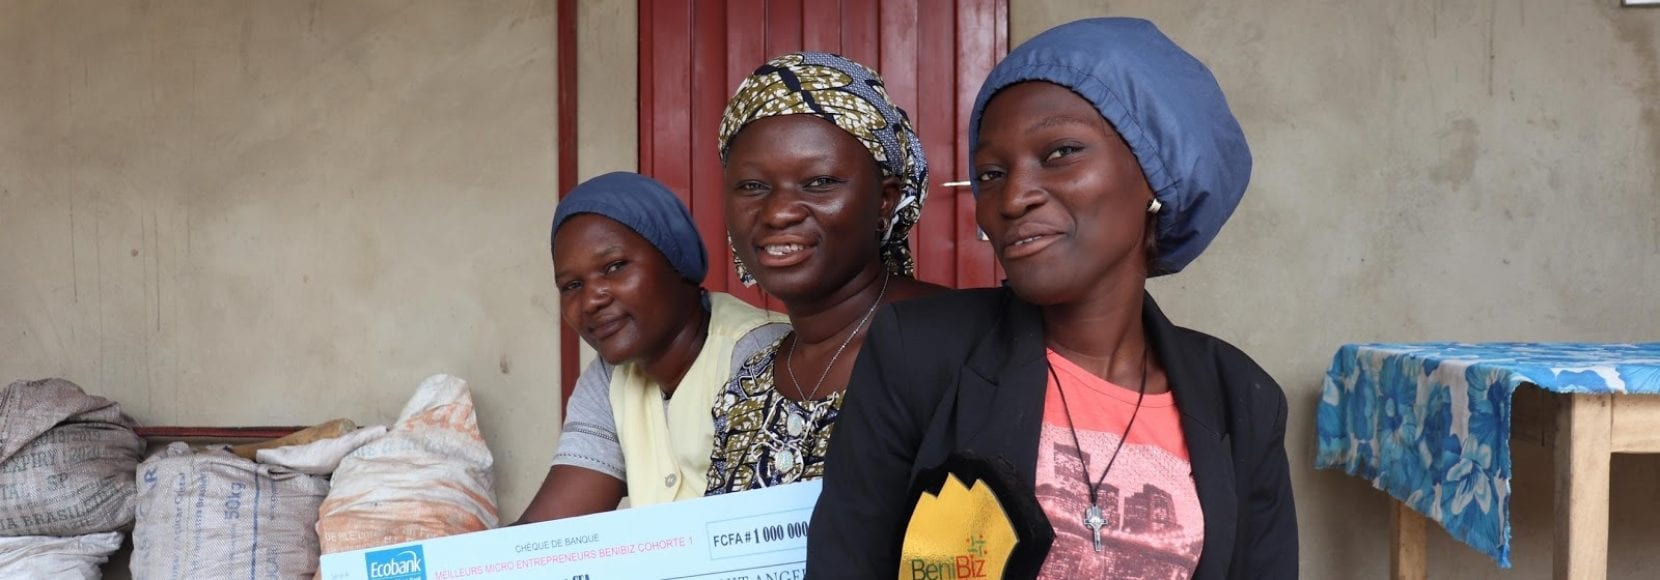 Three women in Benin smiling after receiving awards